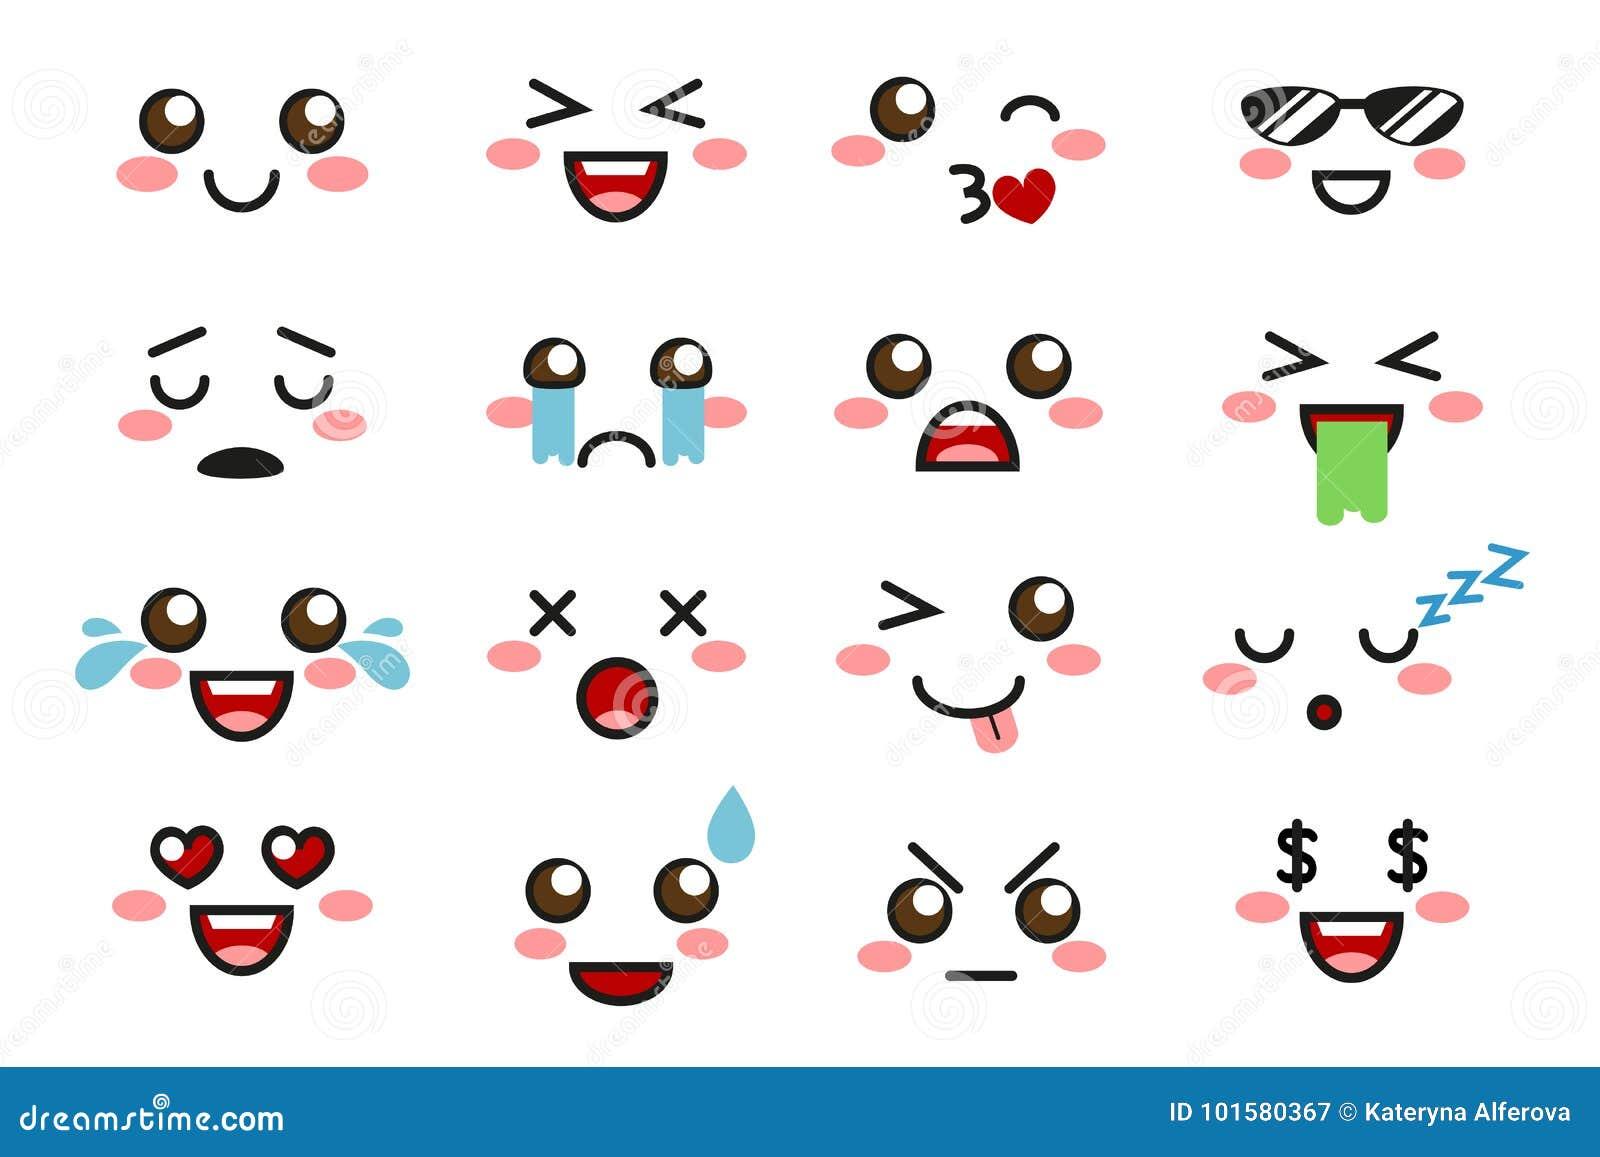 Kawaii emoji cute emoticons stock vector illustration of drawing caricature 101580367 - Emoticone kawaii ...